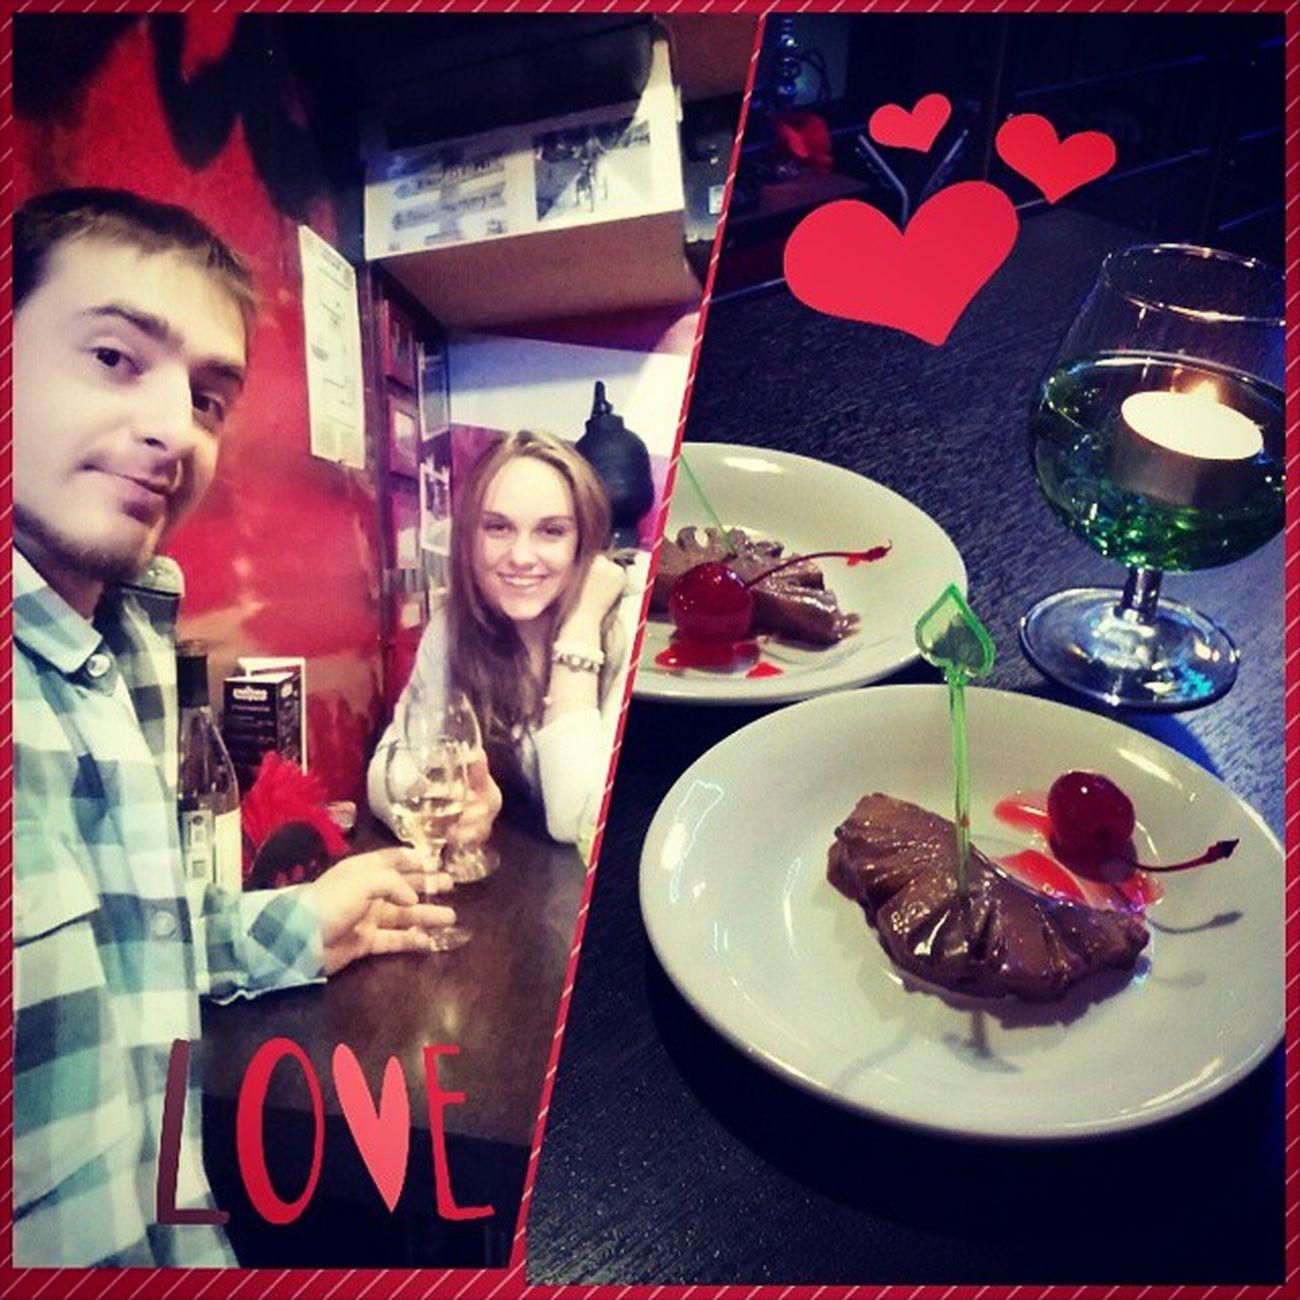 Люблю тебя @samopalkam 😙😘❤❤❤❤❤❤❤❤❤14февраля Valentineday деньвсехвлюбленных